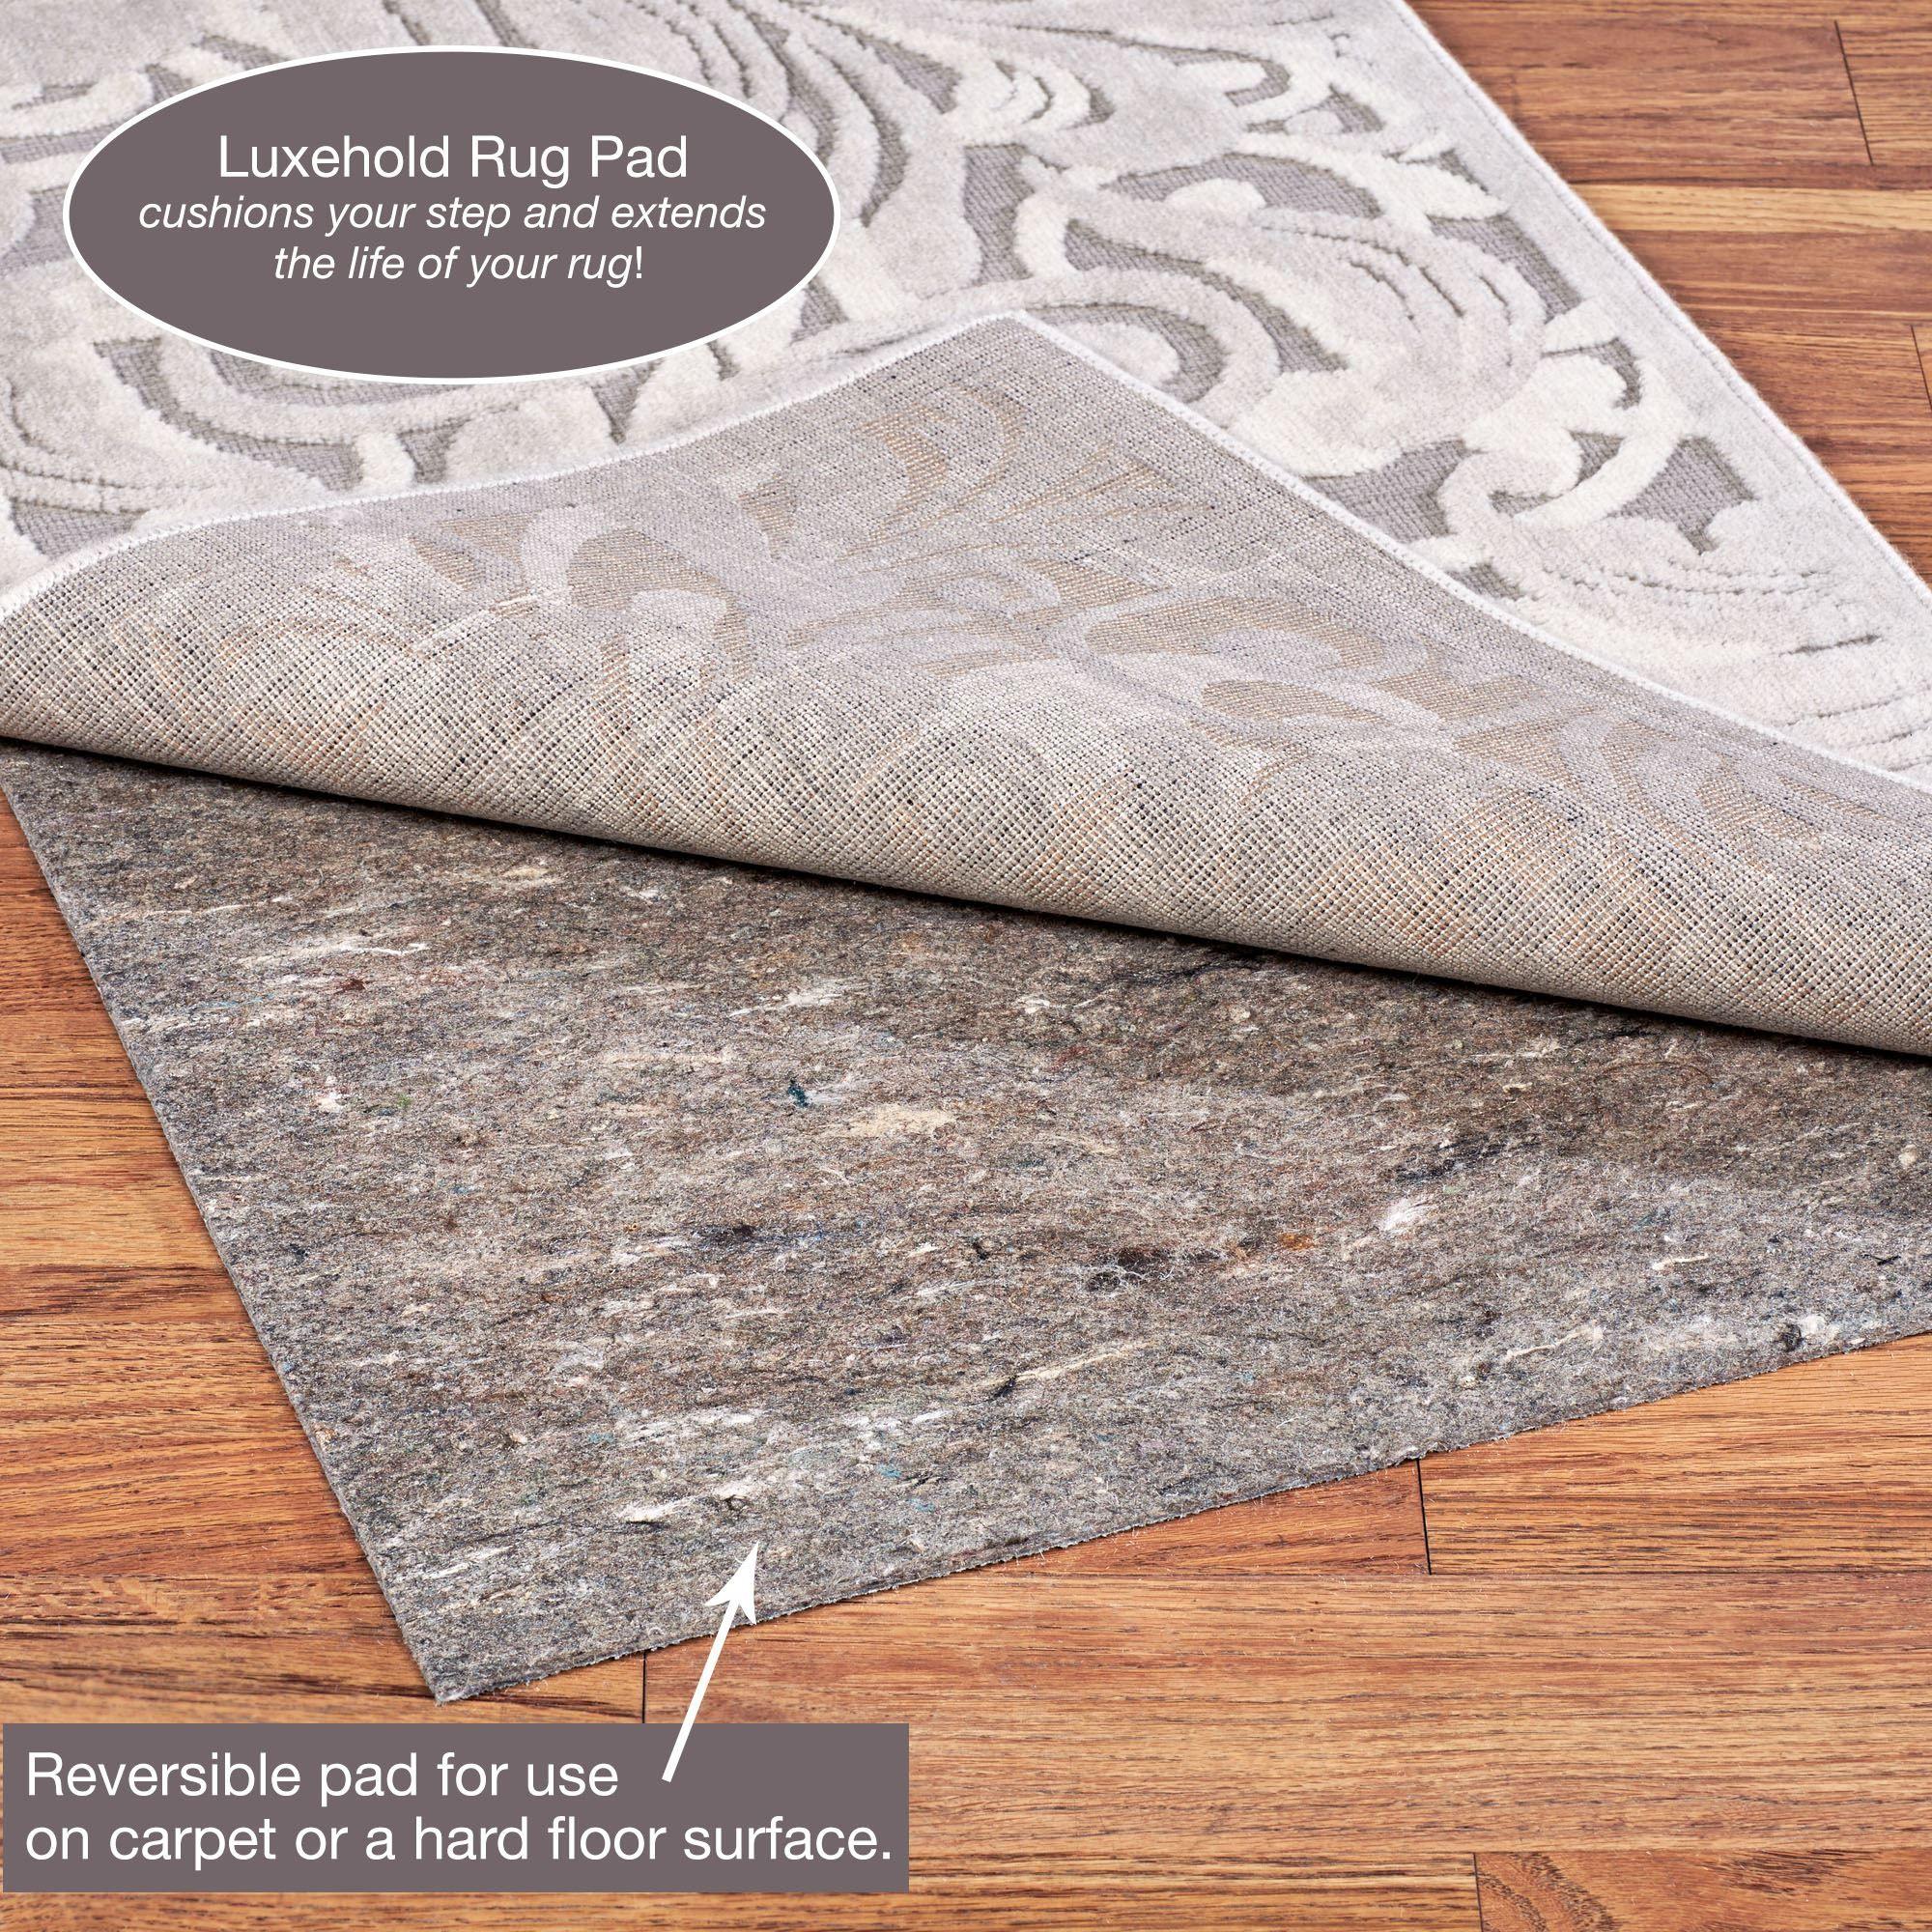 old pad cleaning heirloom greensboro raleigh clean pads rugs nc rug